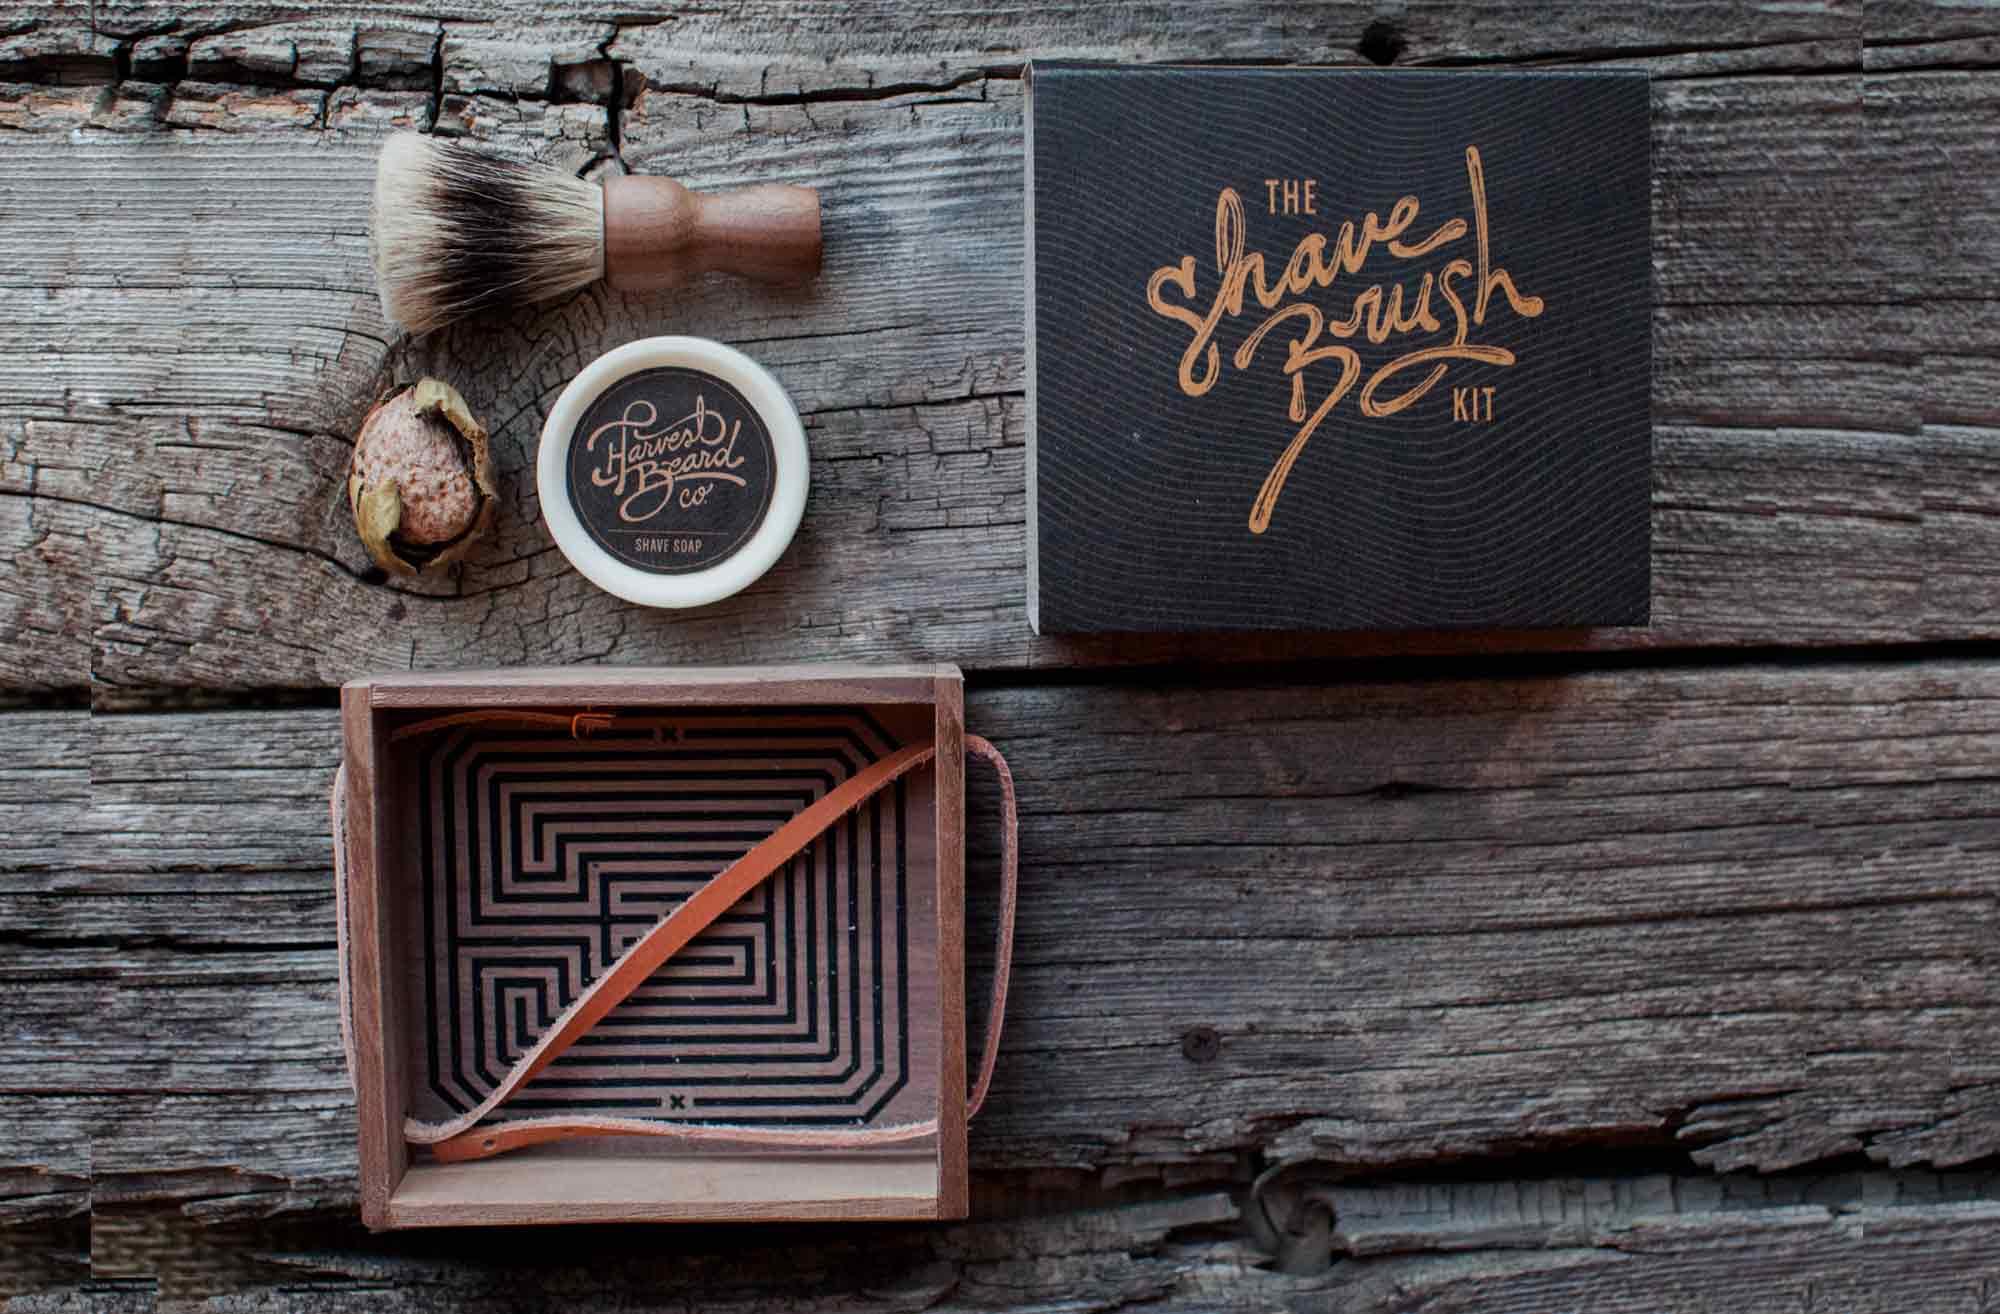 Smithandcox_Site_Bigs_Harvestbeard_shavingbrush_kit_03